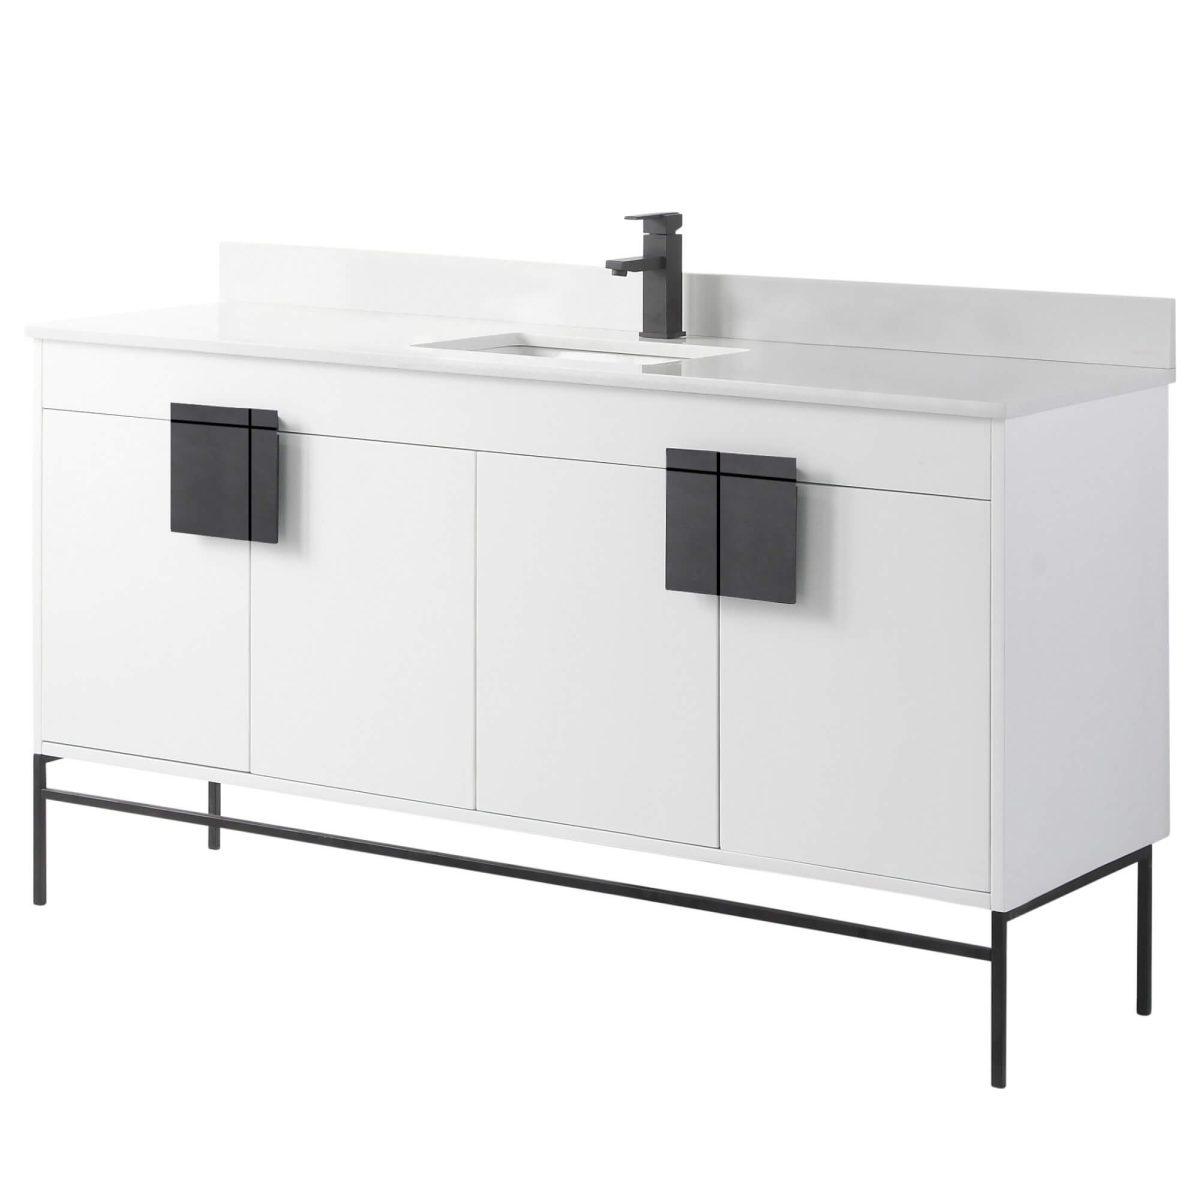 "Shawbridge 60"" Modern Single Bathroom Vanity  White with Black Hardware"